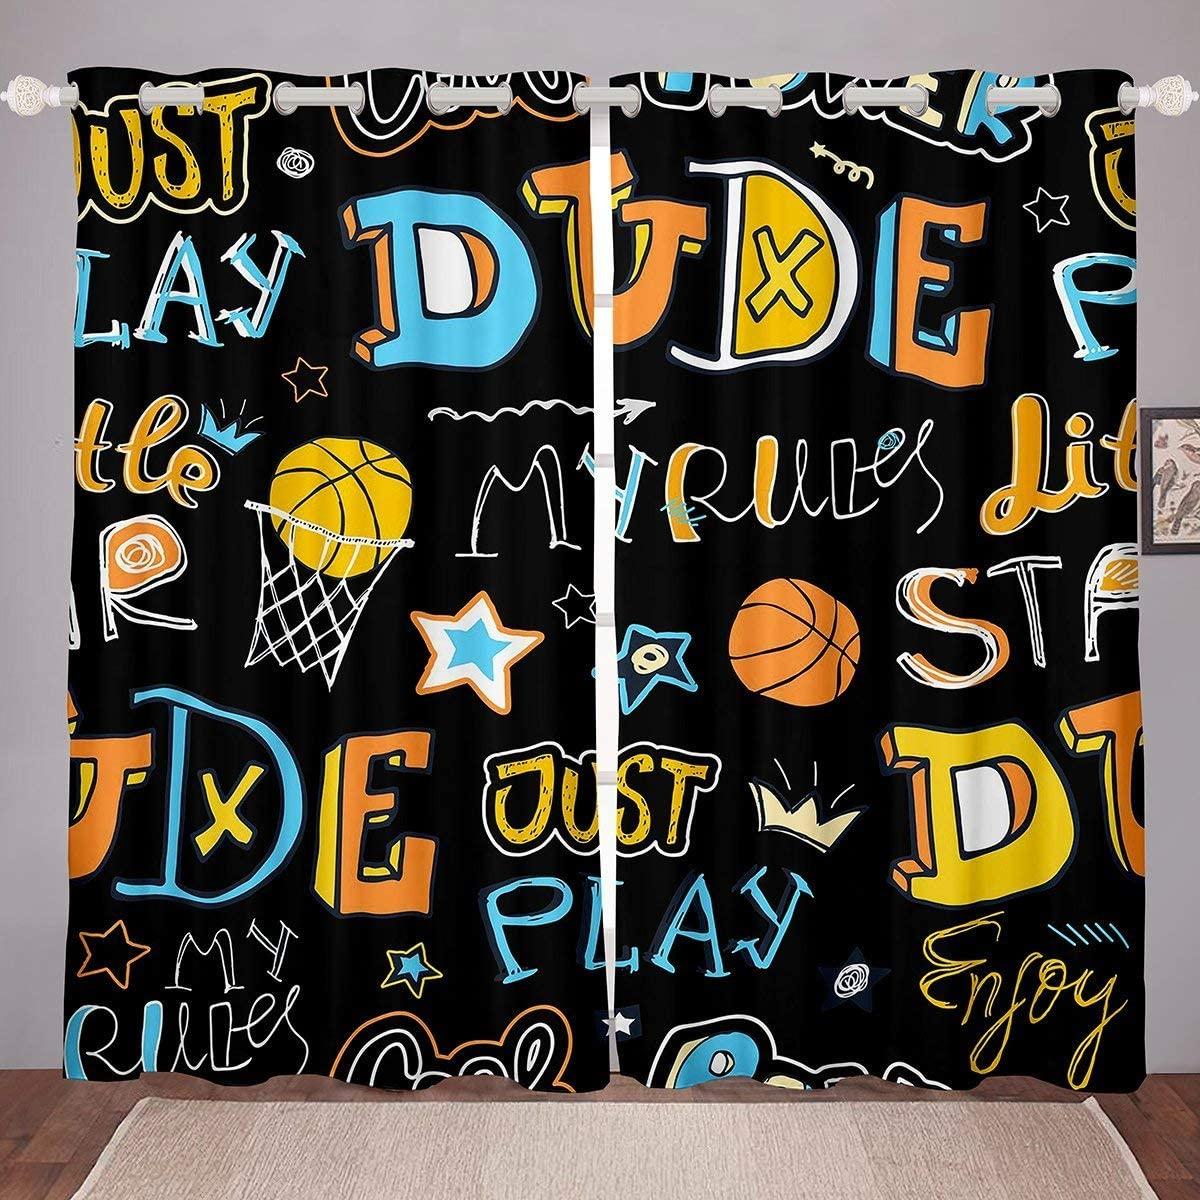 Erosebridal Boys Basketball Window Curtain Panels, Stars Crown Window Drapes for Kids Girls Children, Sports Games Curtains Cartoon Style Curtains Blackout Teens Adult Bedroom Decor 104